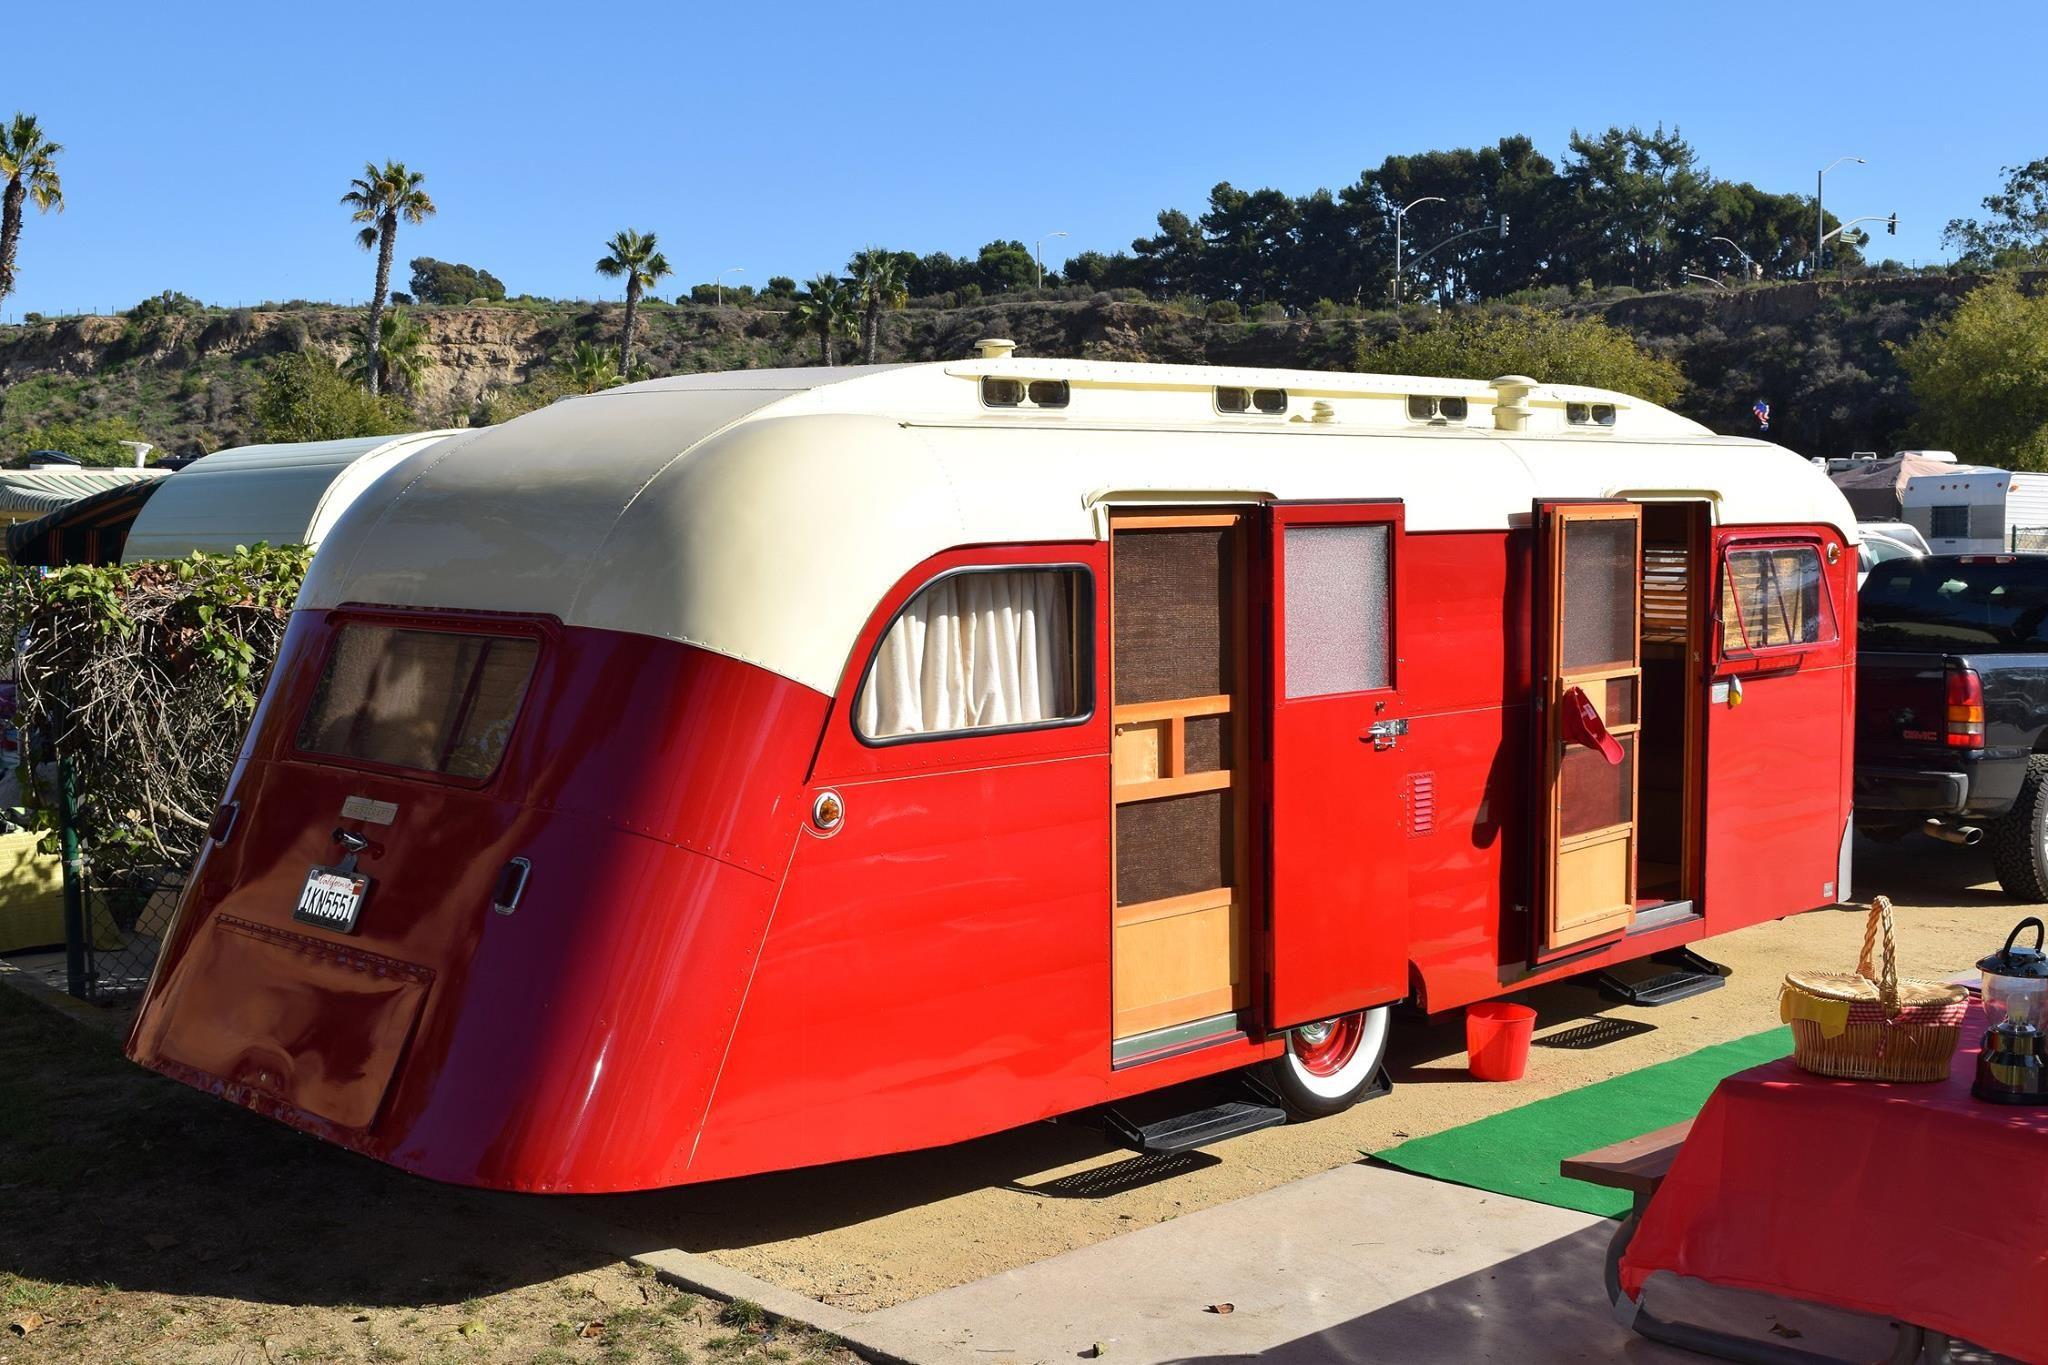 1948 westwood trolley top or lantern top caravanes pinterest caravane. Black Bedroom Furniture Sets. Home Design Ideas